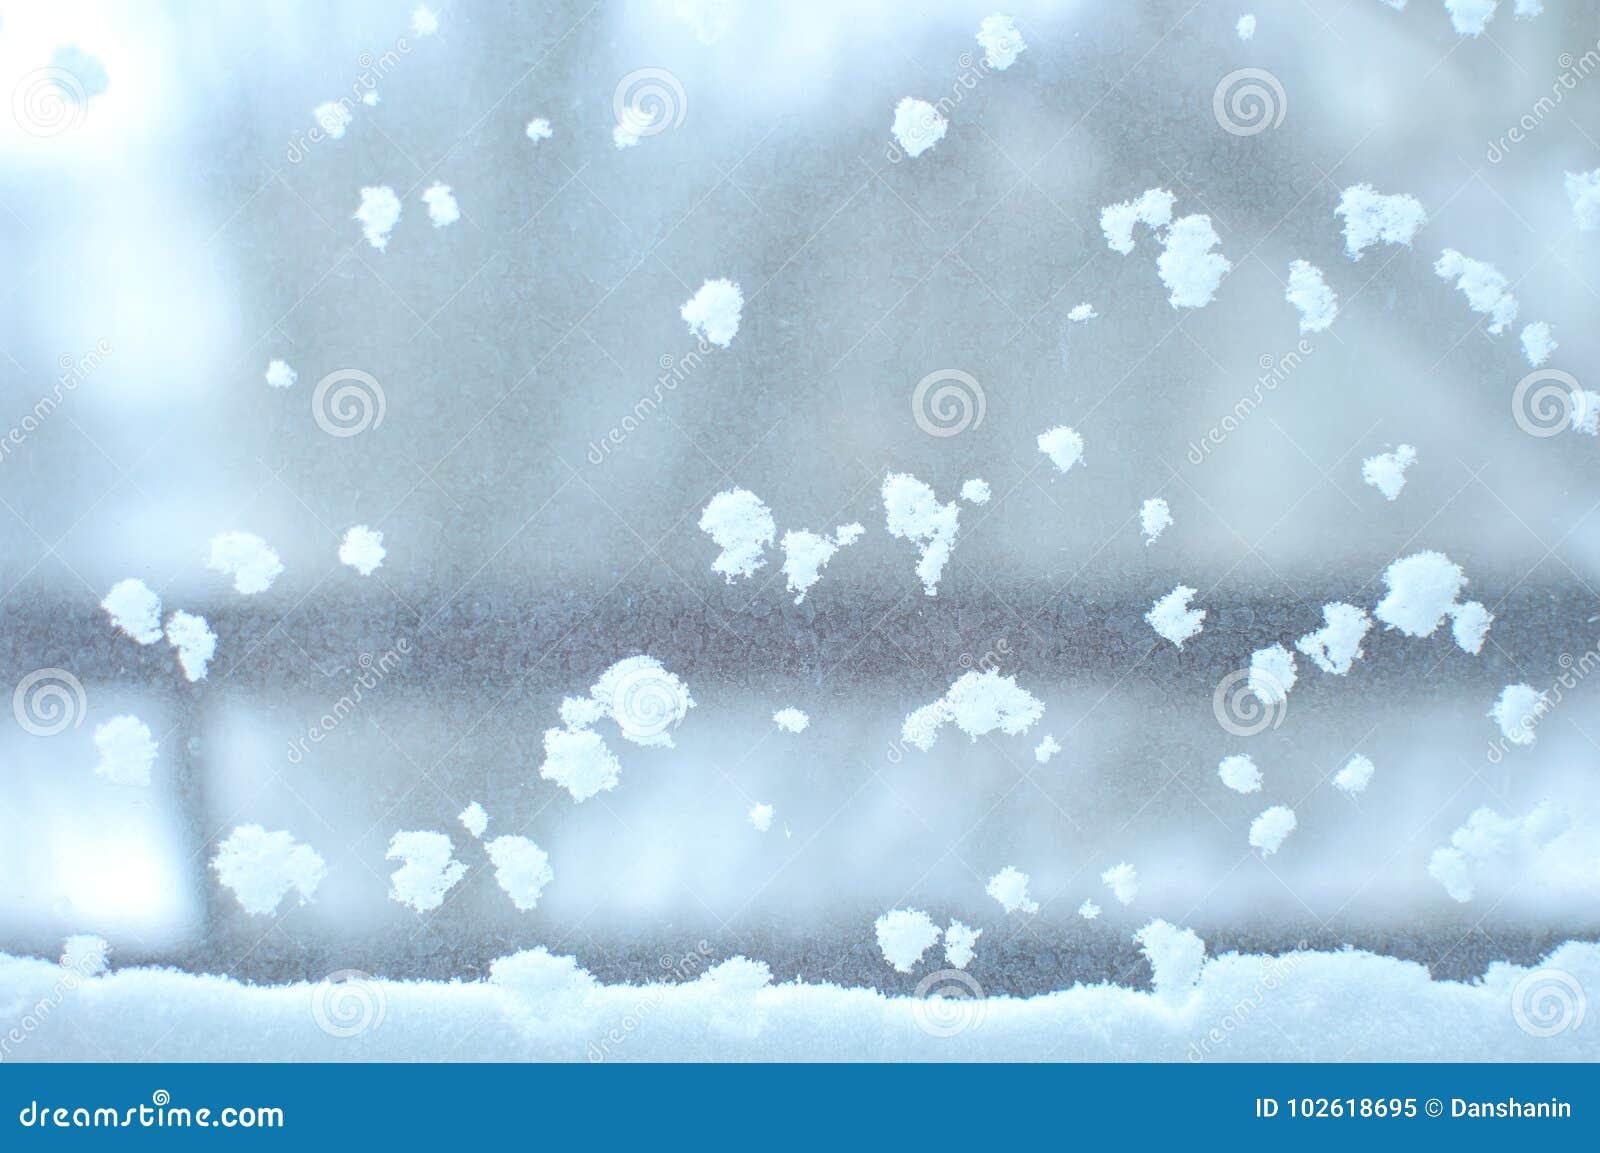 Snowbound window close-up, indoor. Seasonal winter weather conditions. Snowy winter background